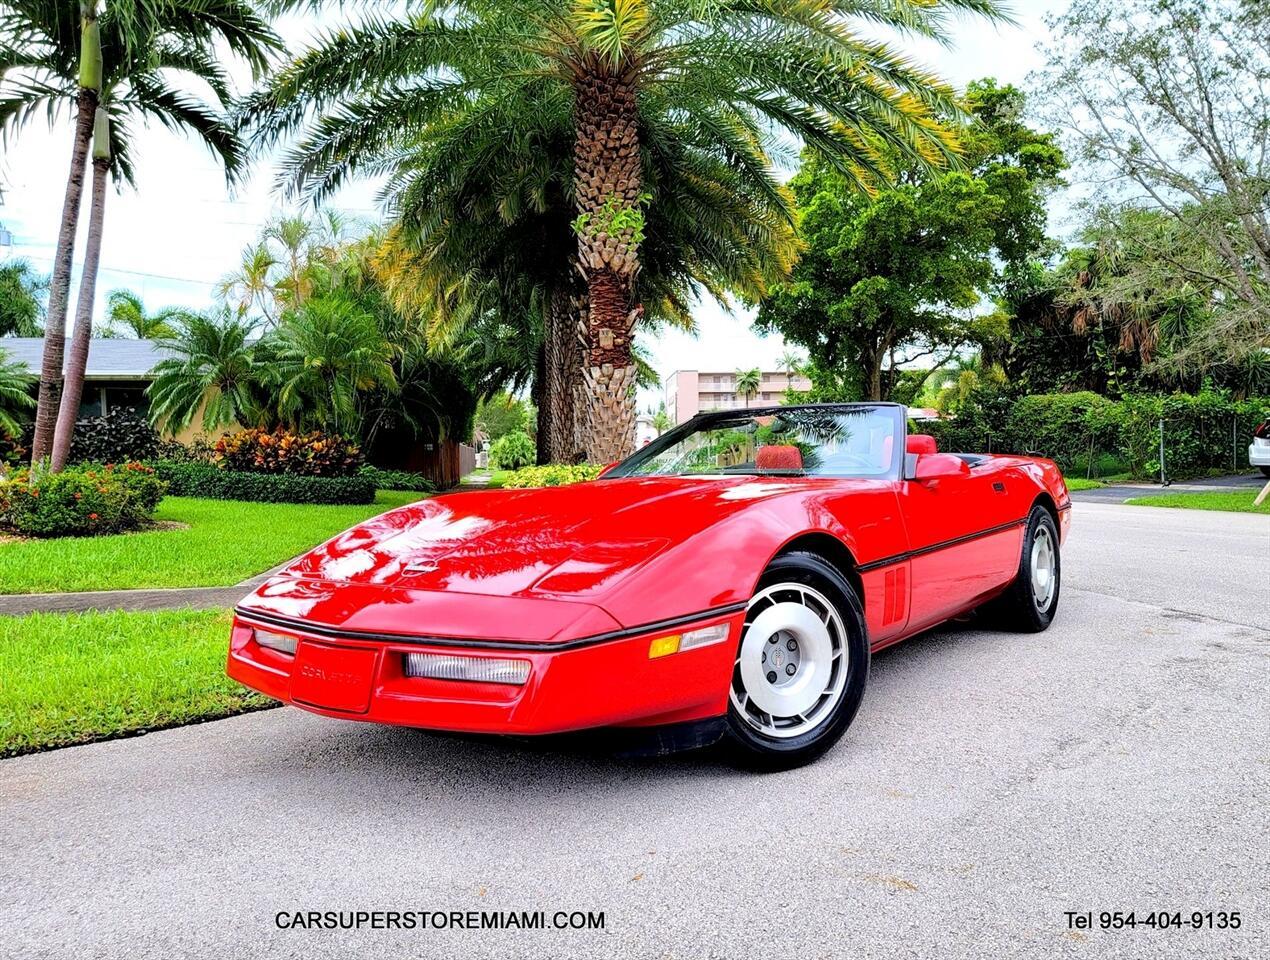 1987 Chevrolet Corvette none